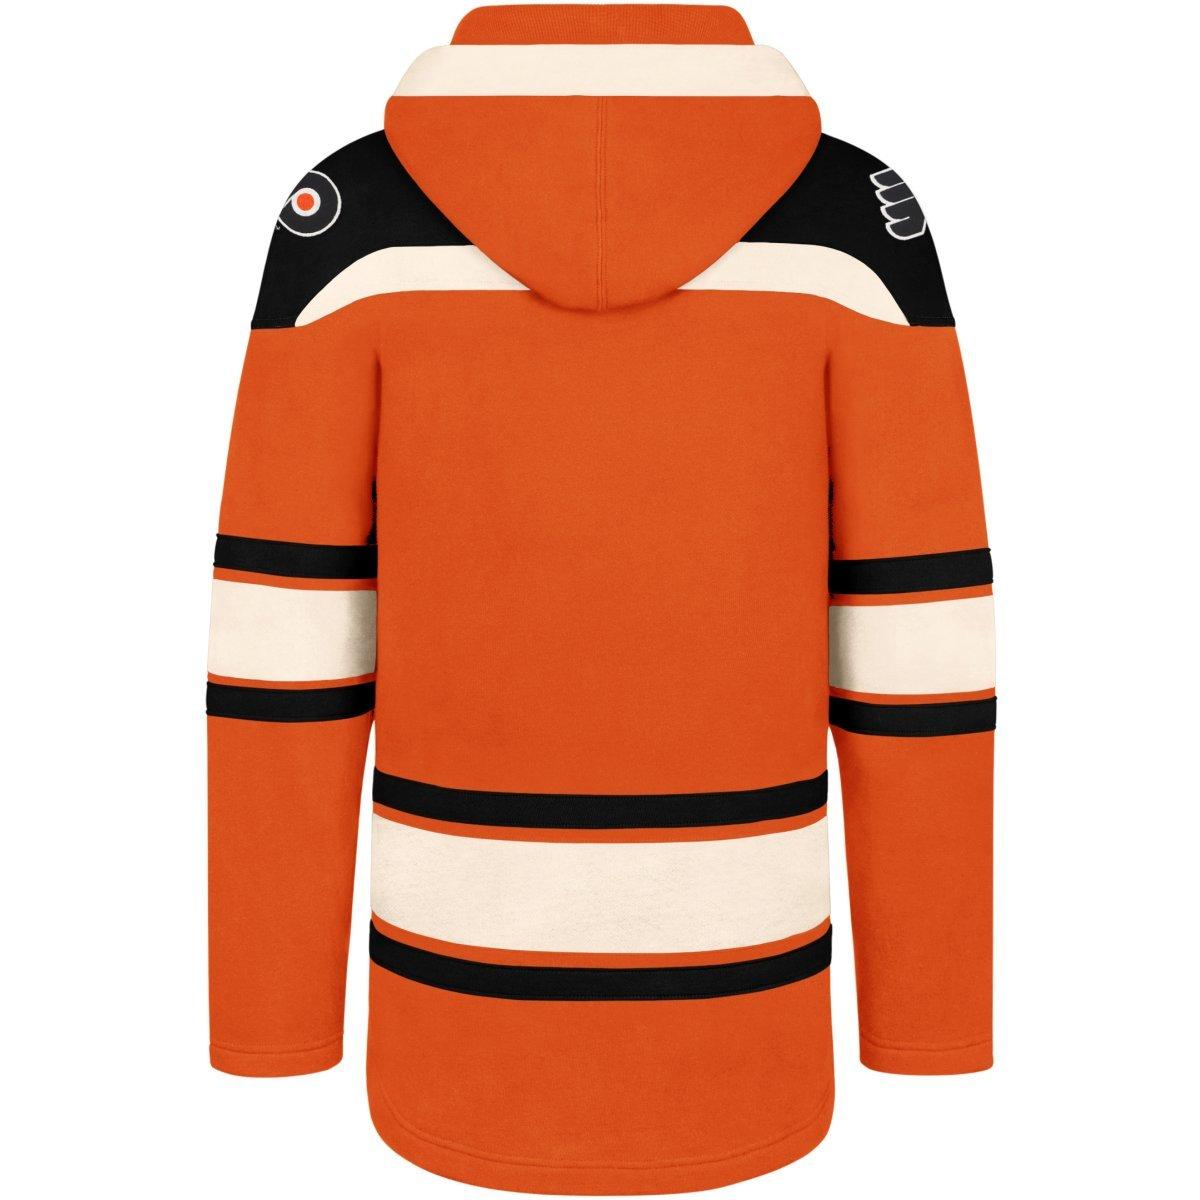 NHL Philadelphia Flyers 47 Brand Lacer Hoodie Kapuzenpullover Sweatshirt Herren Eishockey